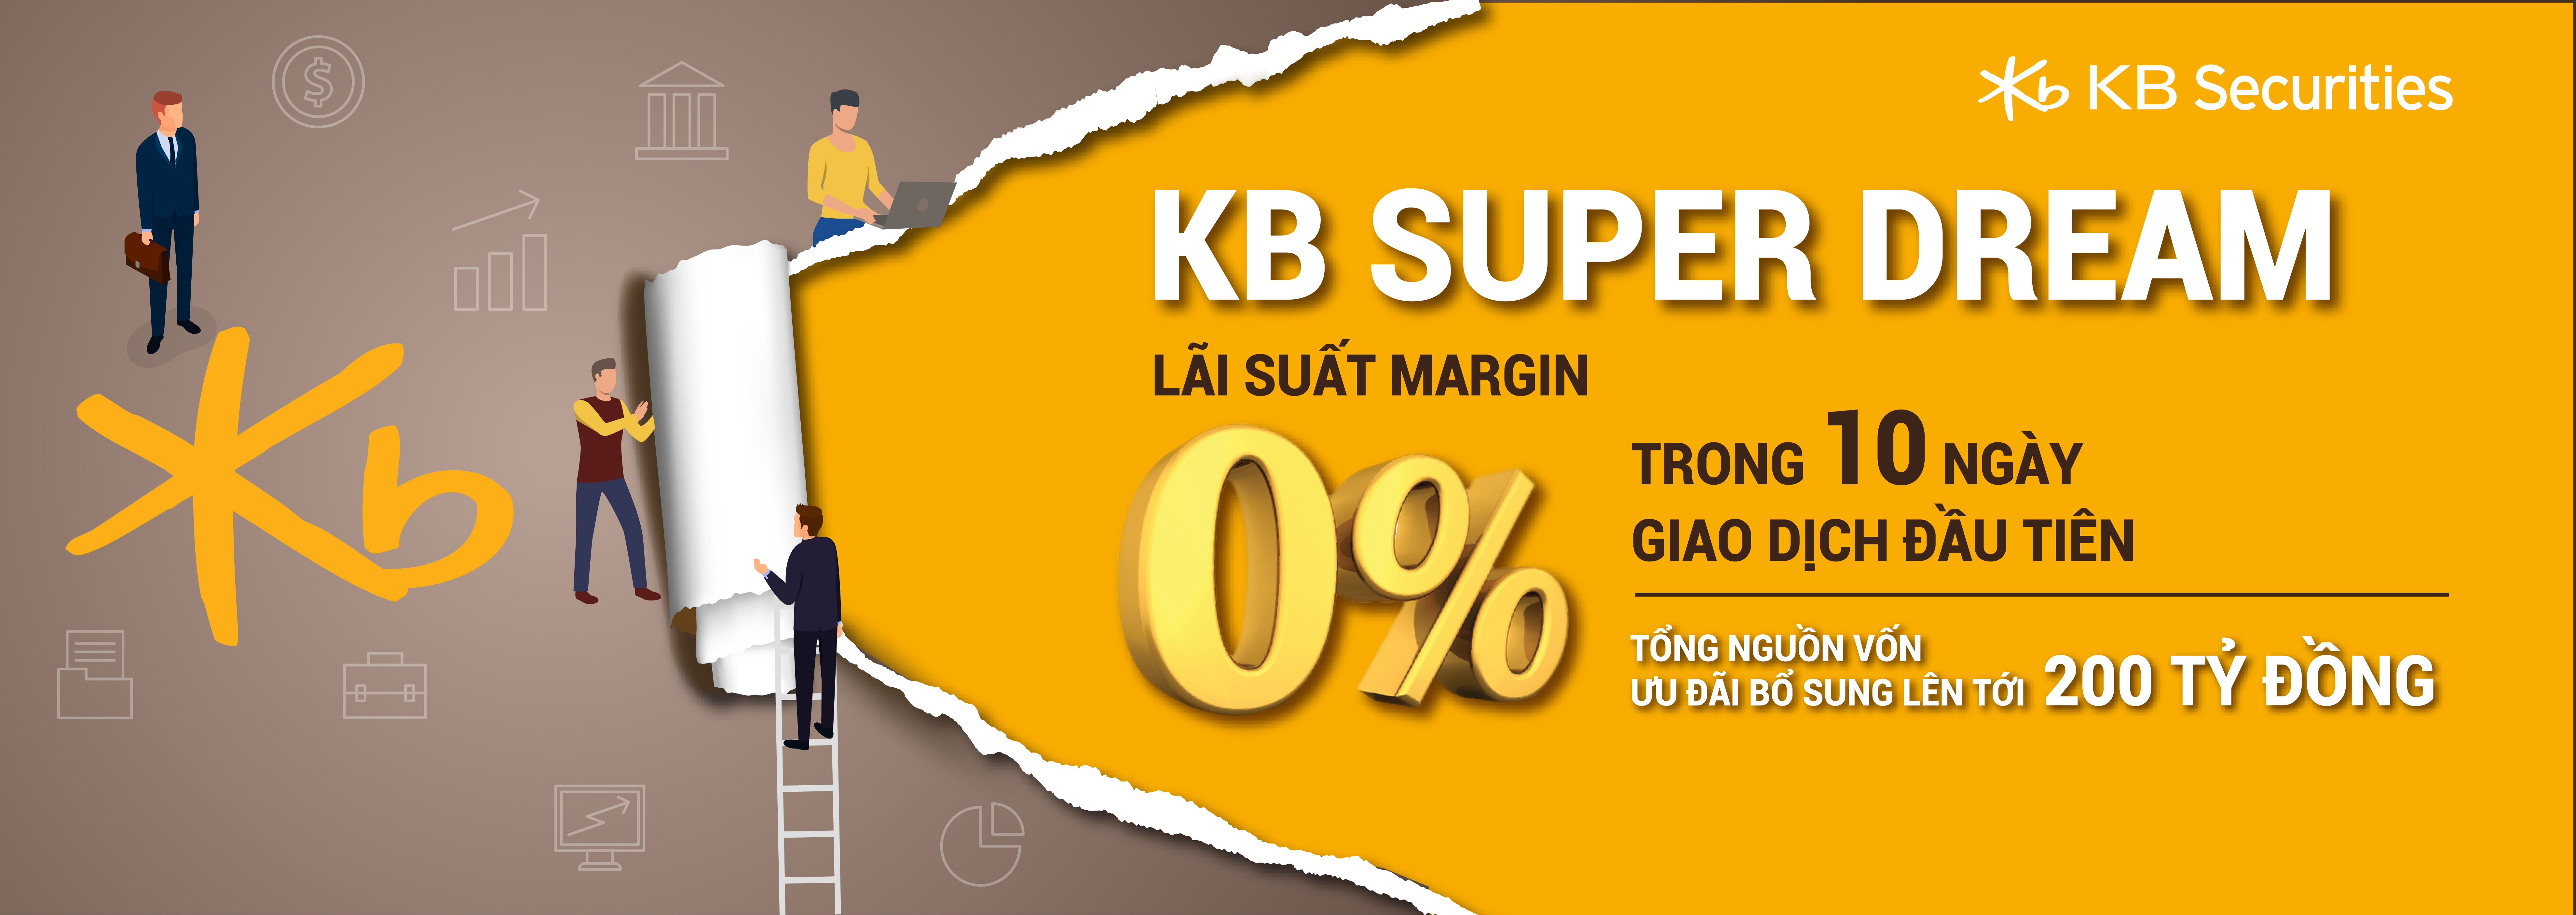 KBSV ưu đãi 0% lãi suất margin